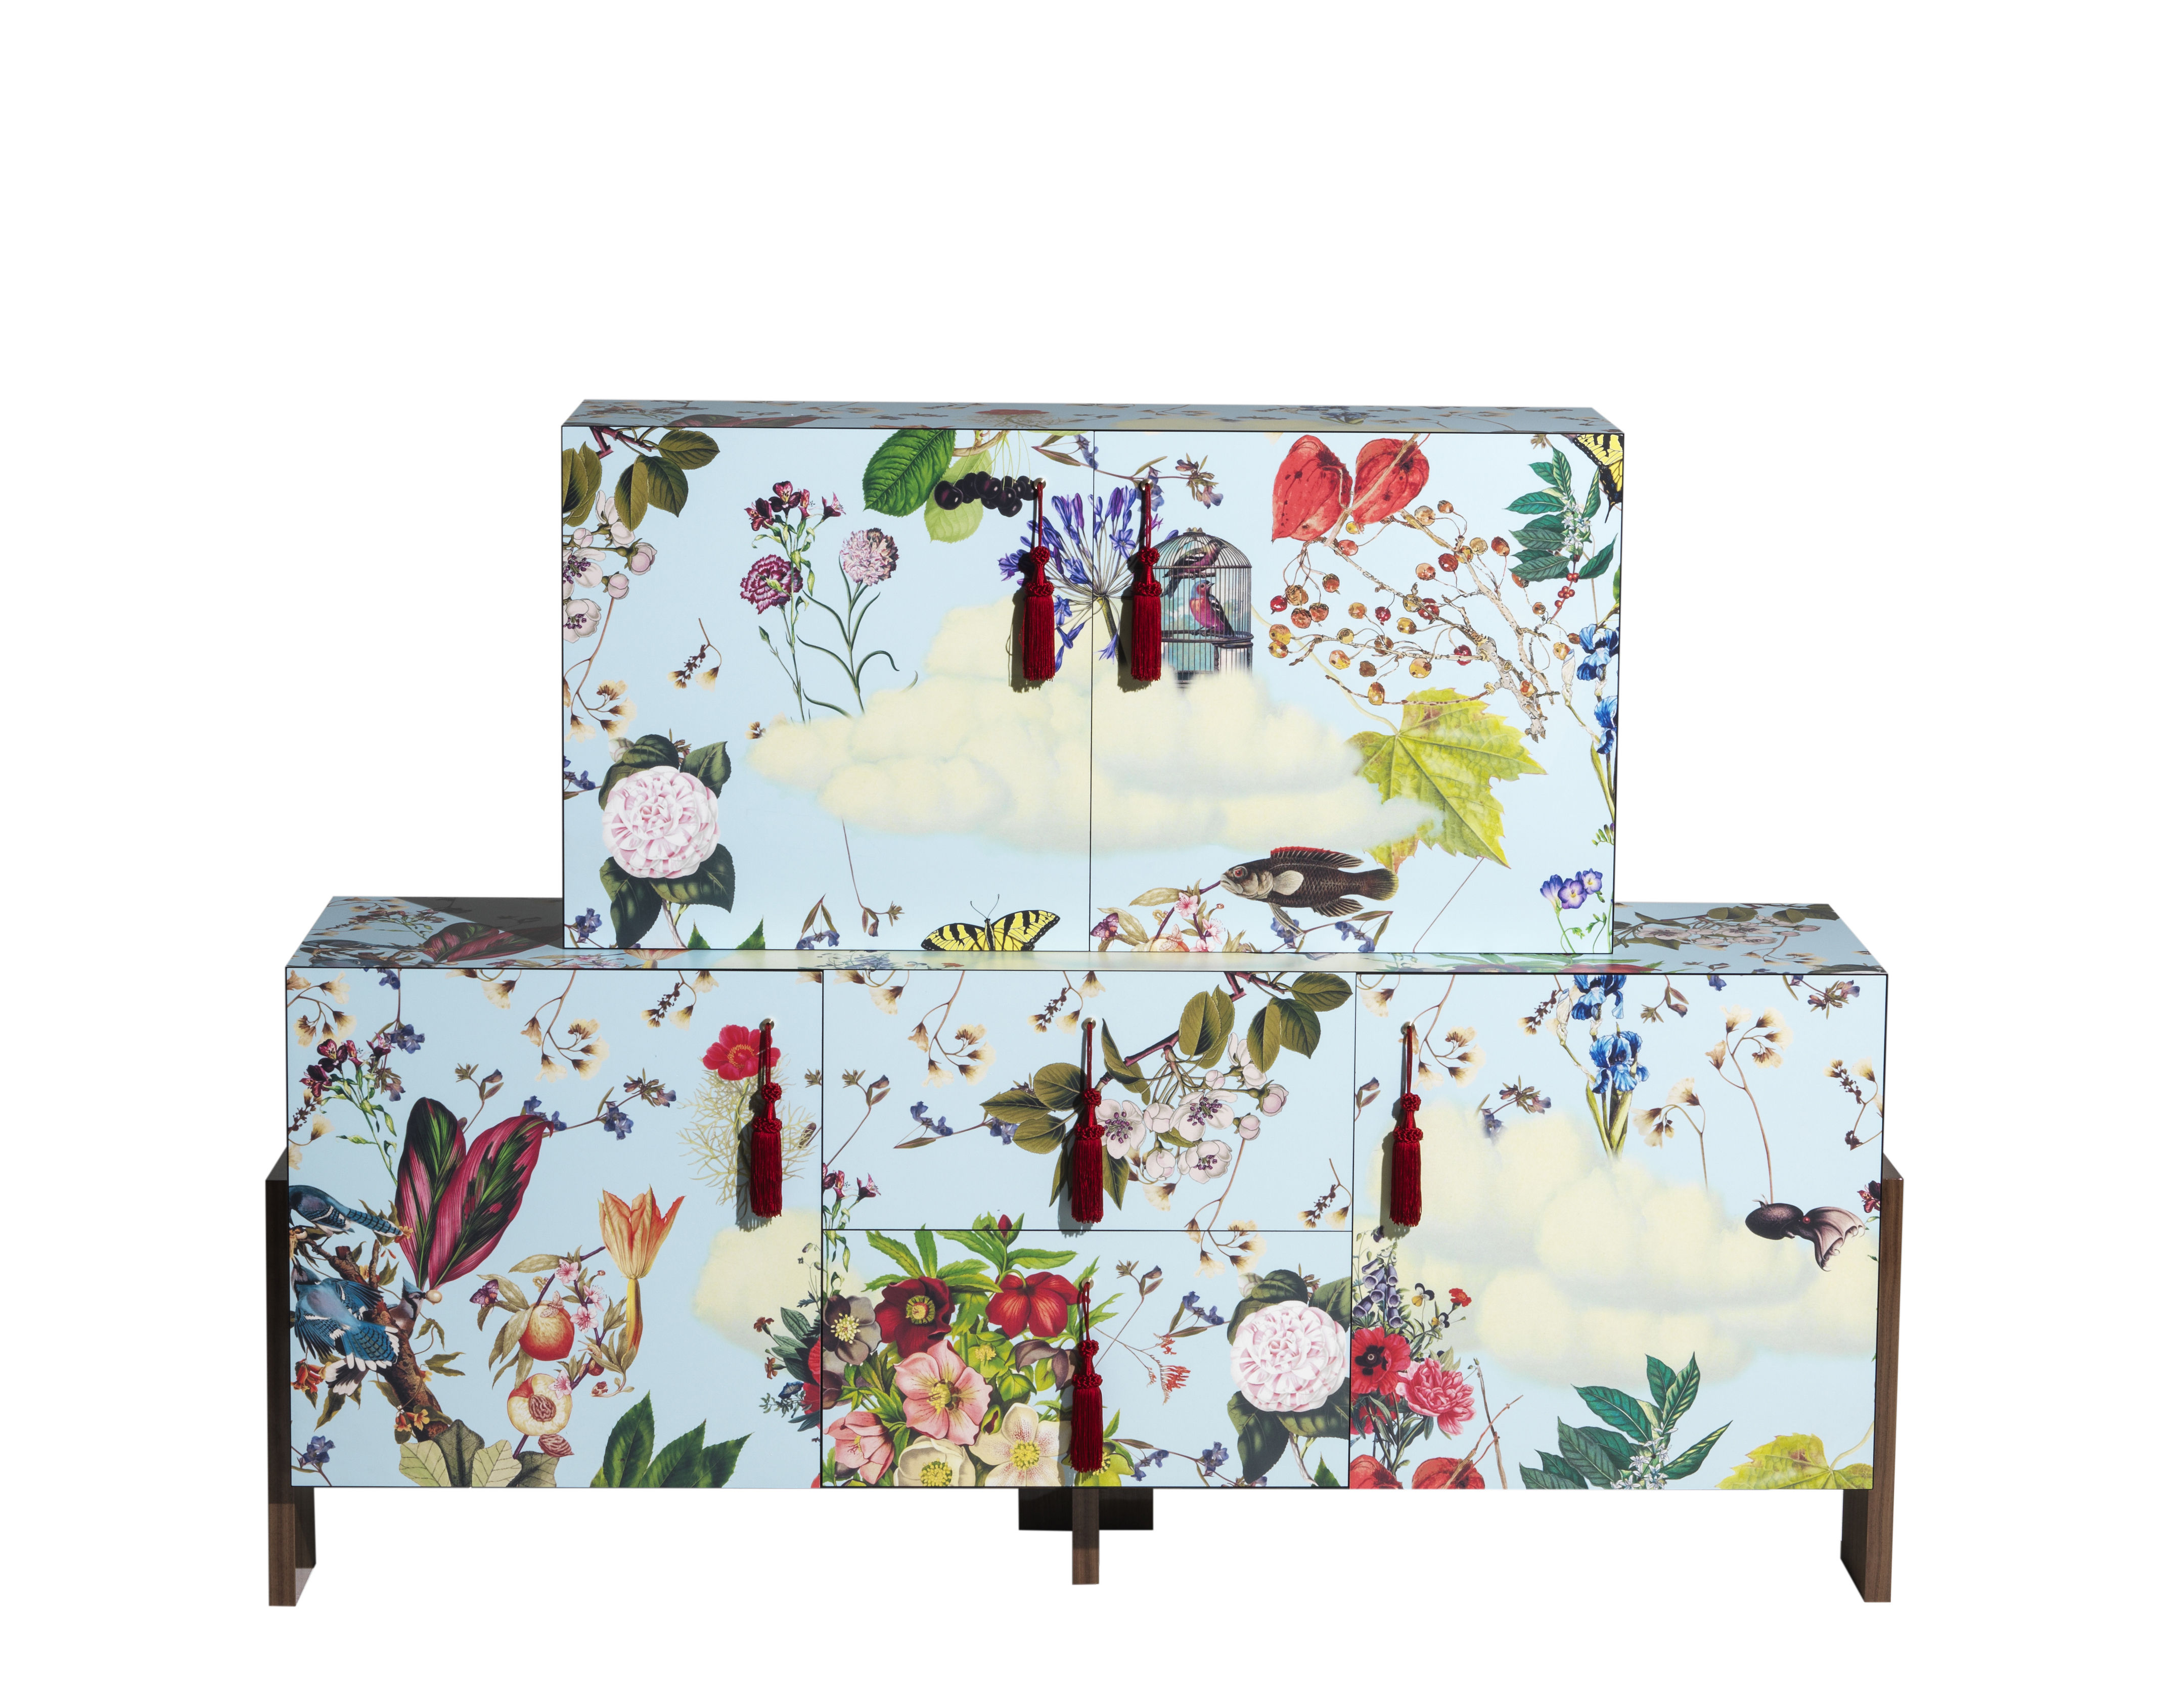 Furniture - Dressers & Storage Units - Ziqqurat Dresser - / L 186 x H 155 cm by Driade - Flowers / Blue background - HPL, Walnut plated MDF